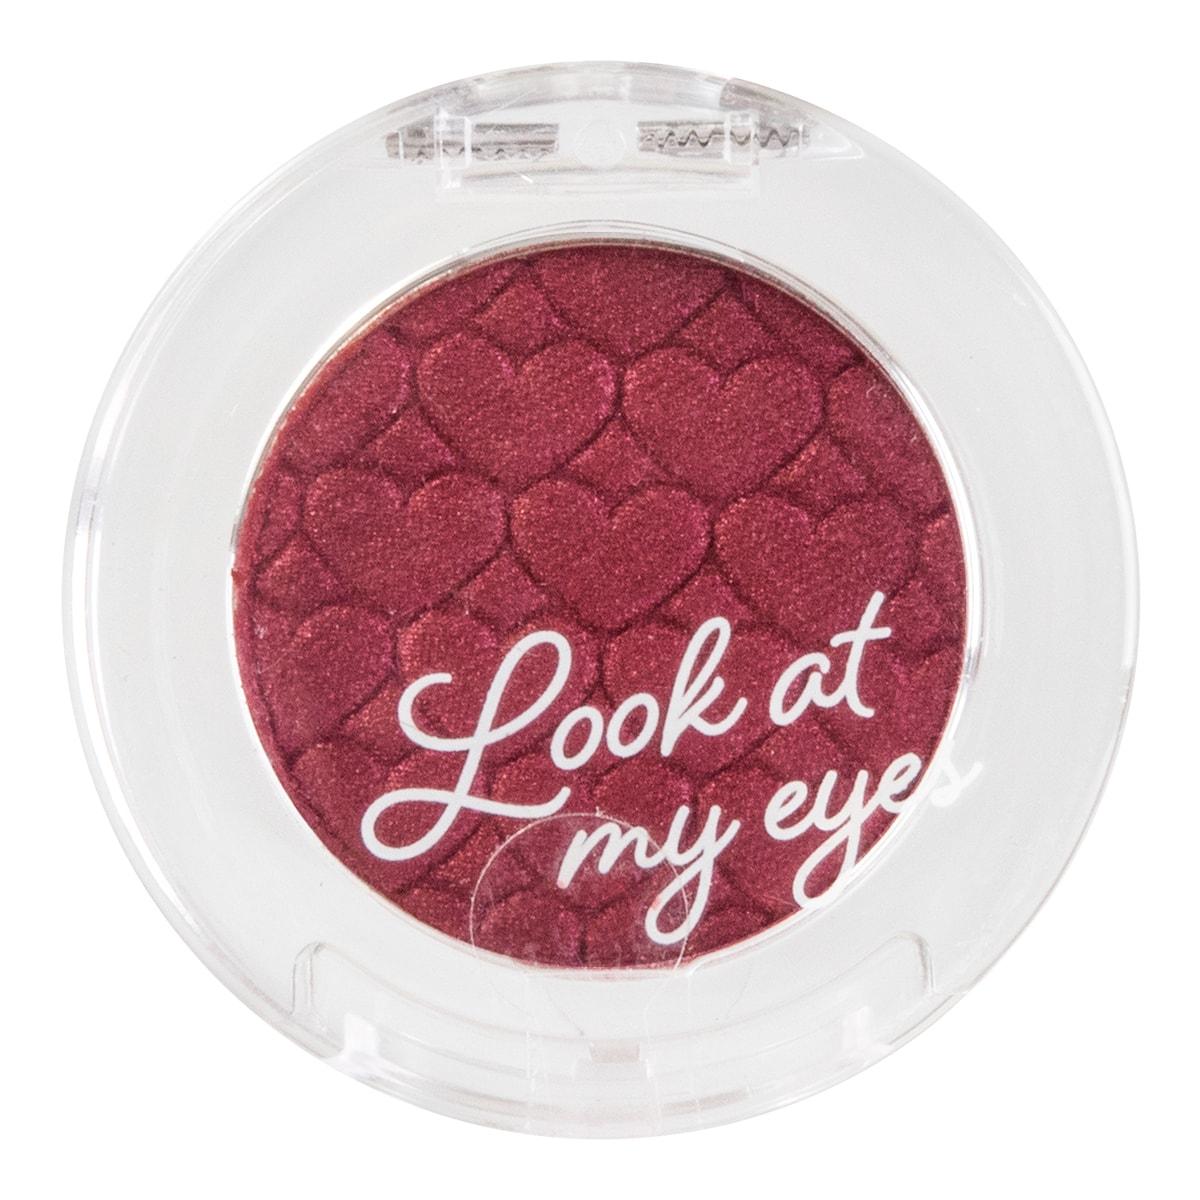 ETUDE HOUSE Look At My Eyes Eyeshadow RD302 Burgundy 1pc